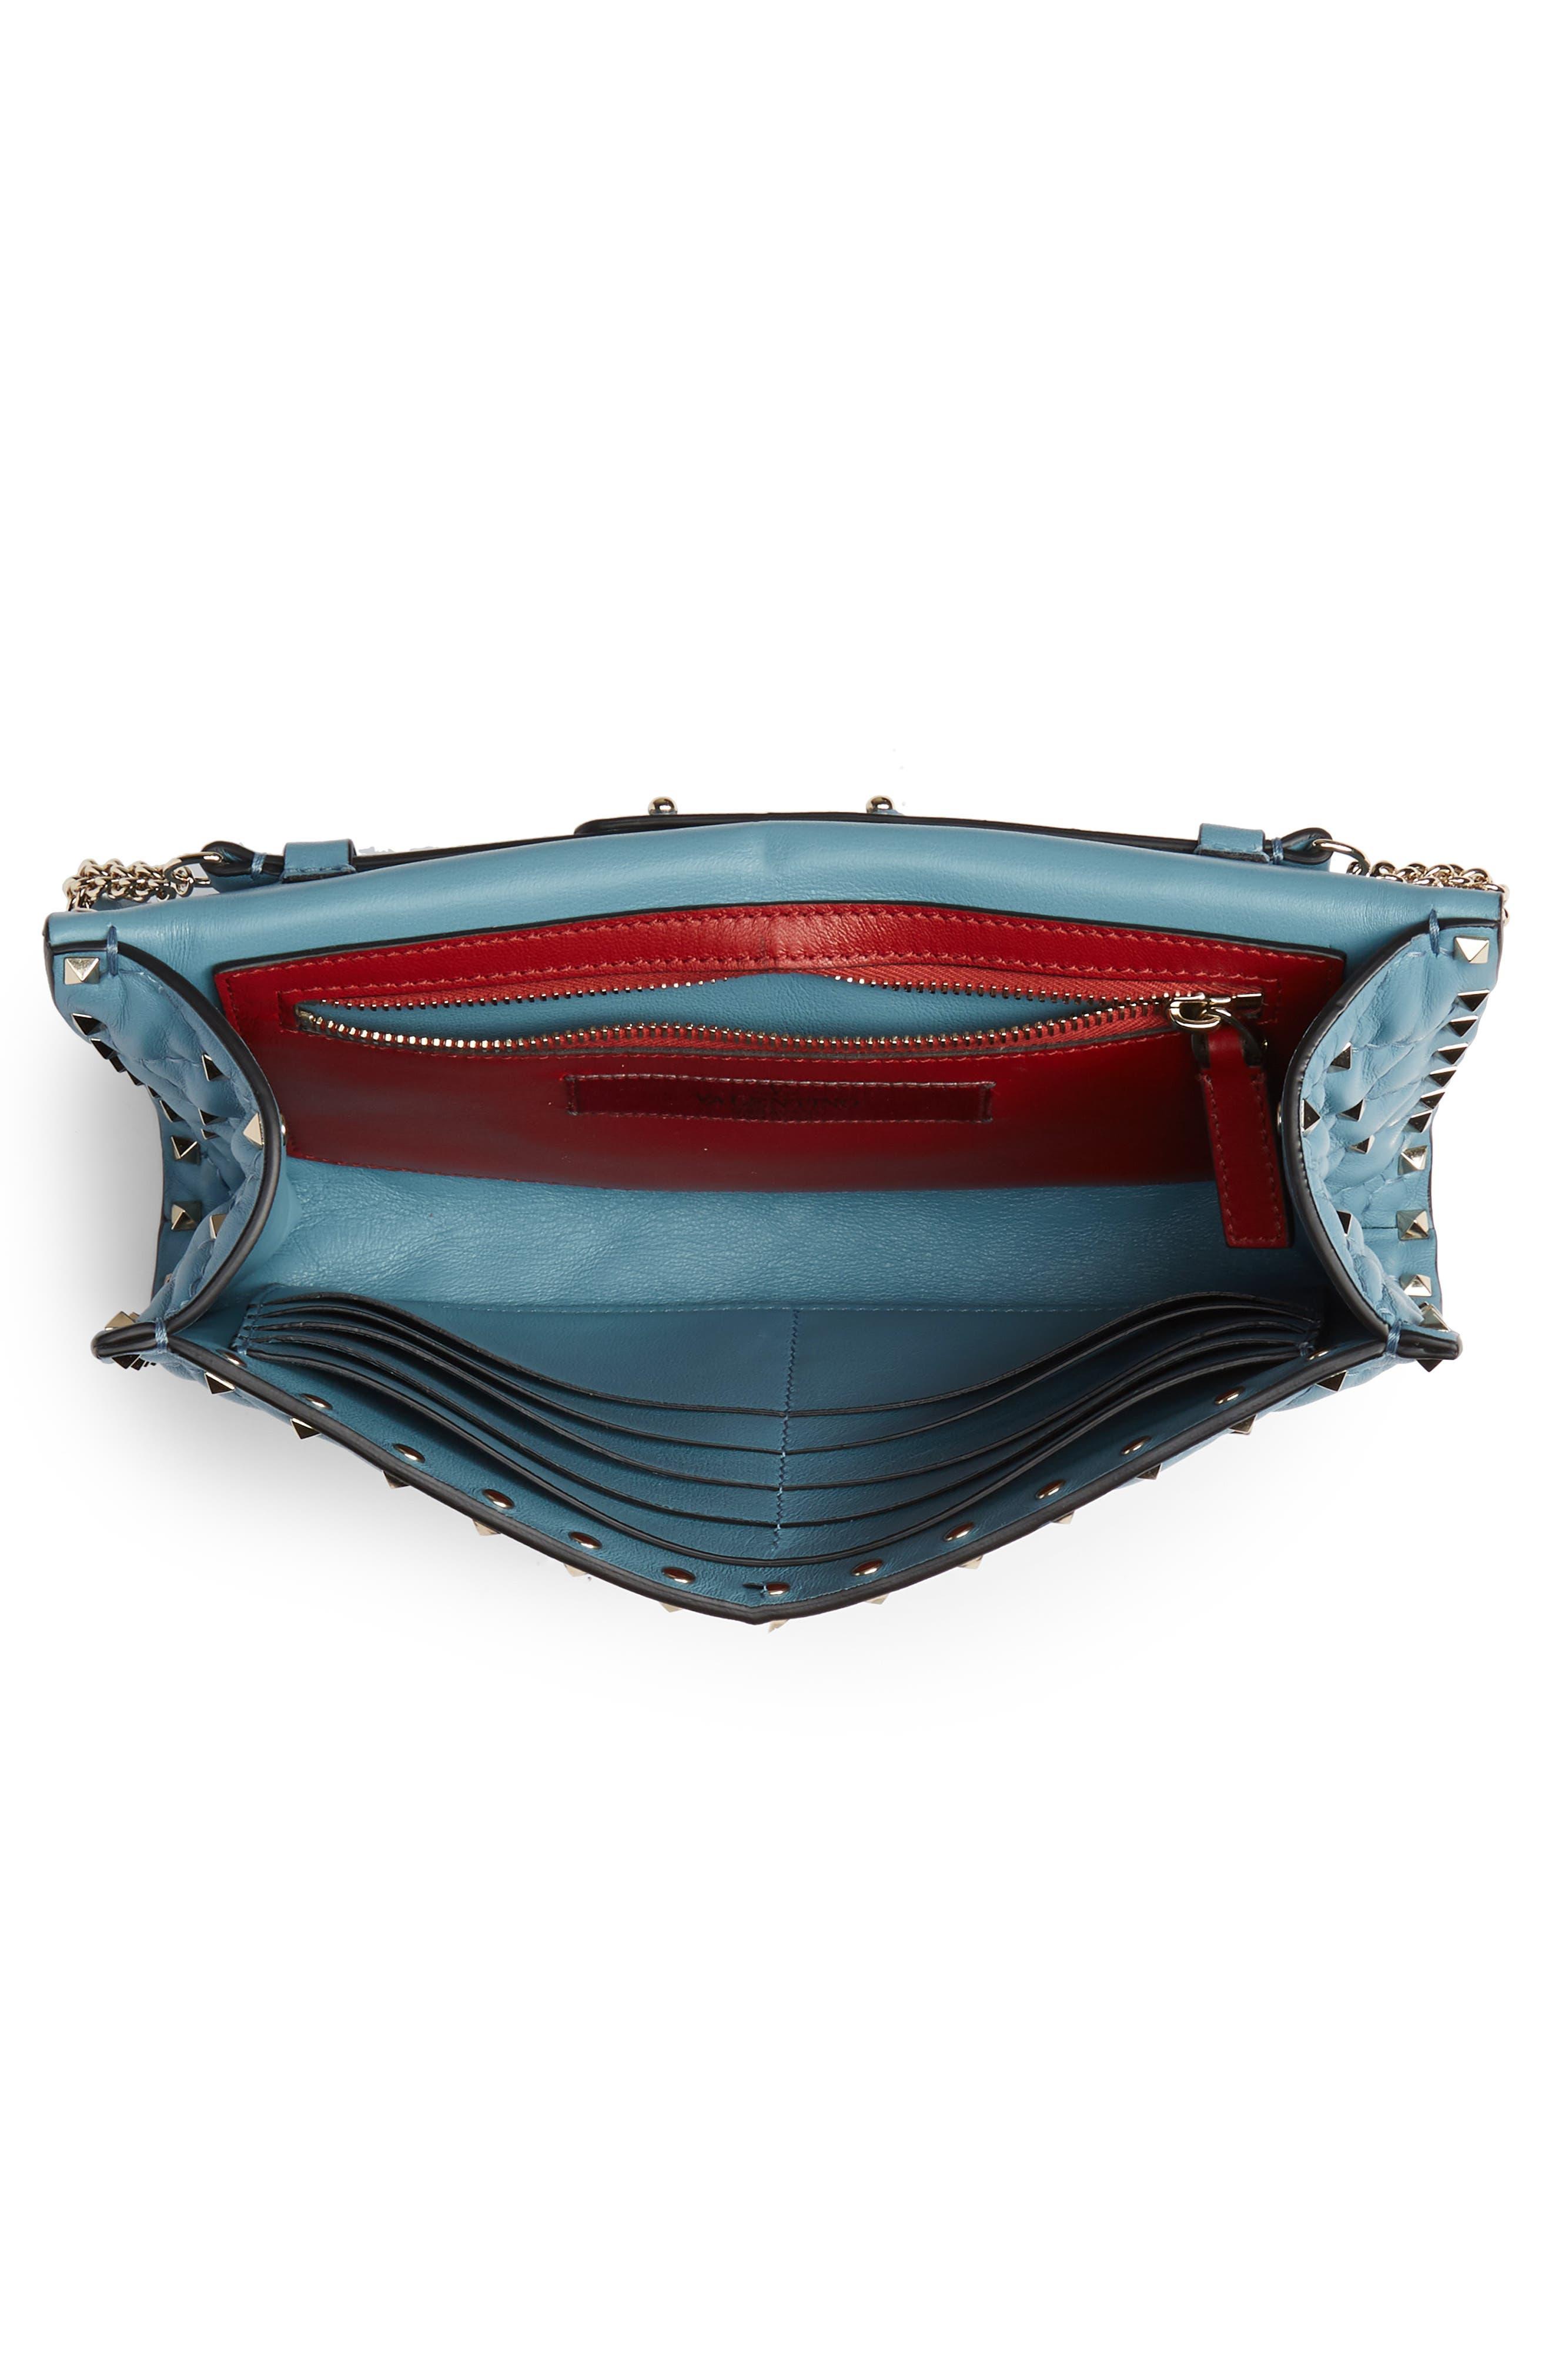 VALENTINO GARAVANI, Rockstud Matelassé Quilted Leather Crossbody Bag, Alternate thumbnail 4, color, ATLANTIQUE